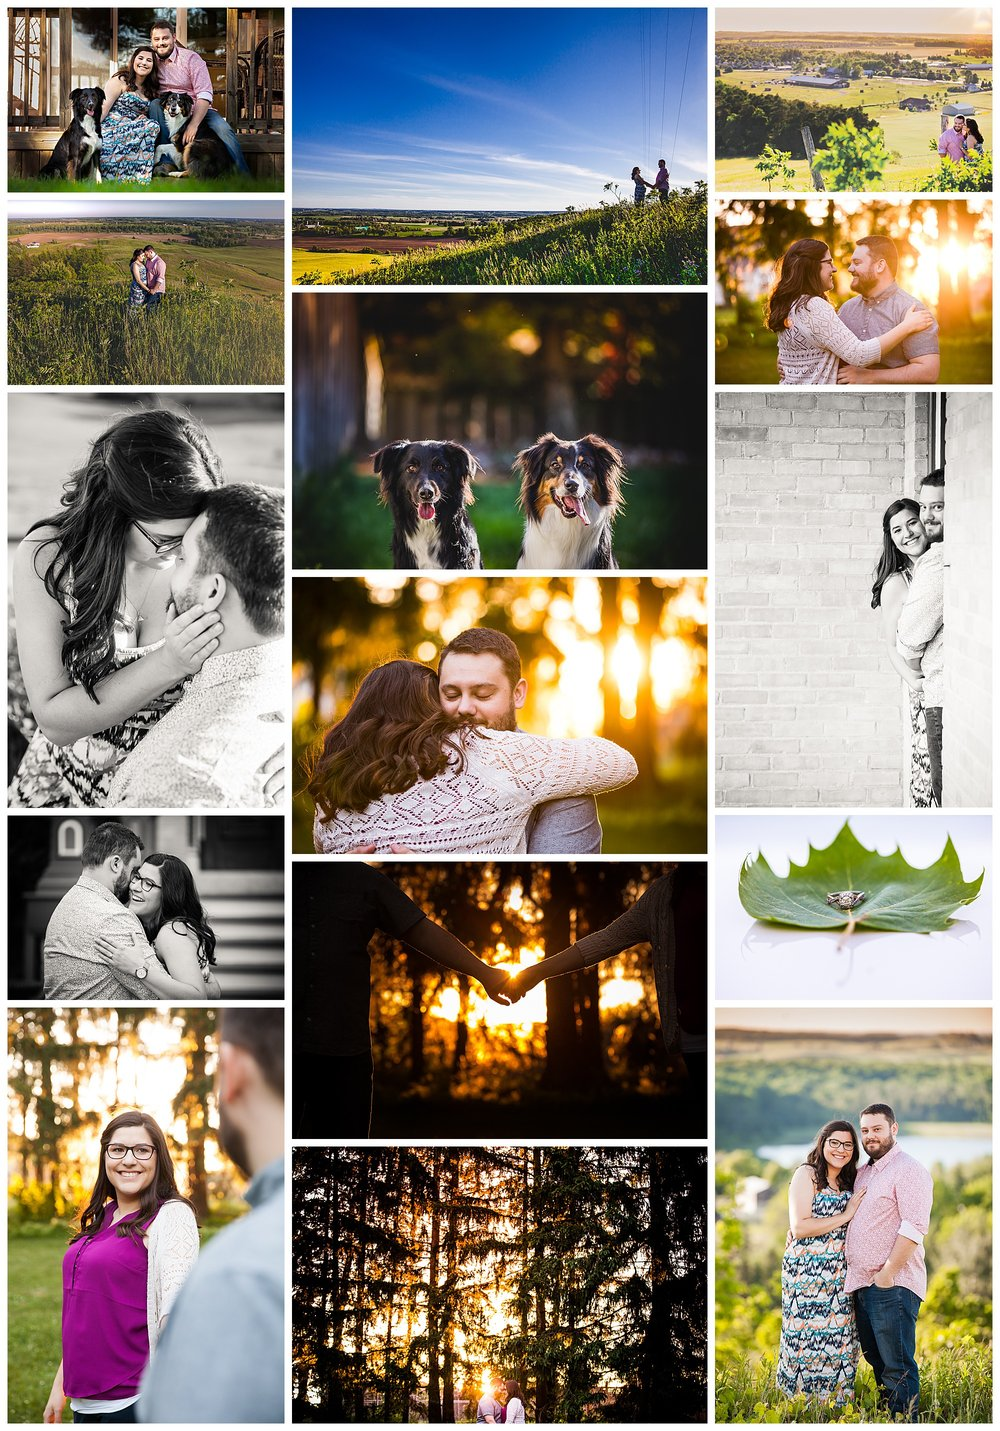 New Hamburg, Ontario engagement photography by VanDaele & Russell